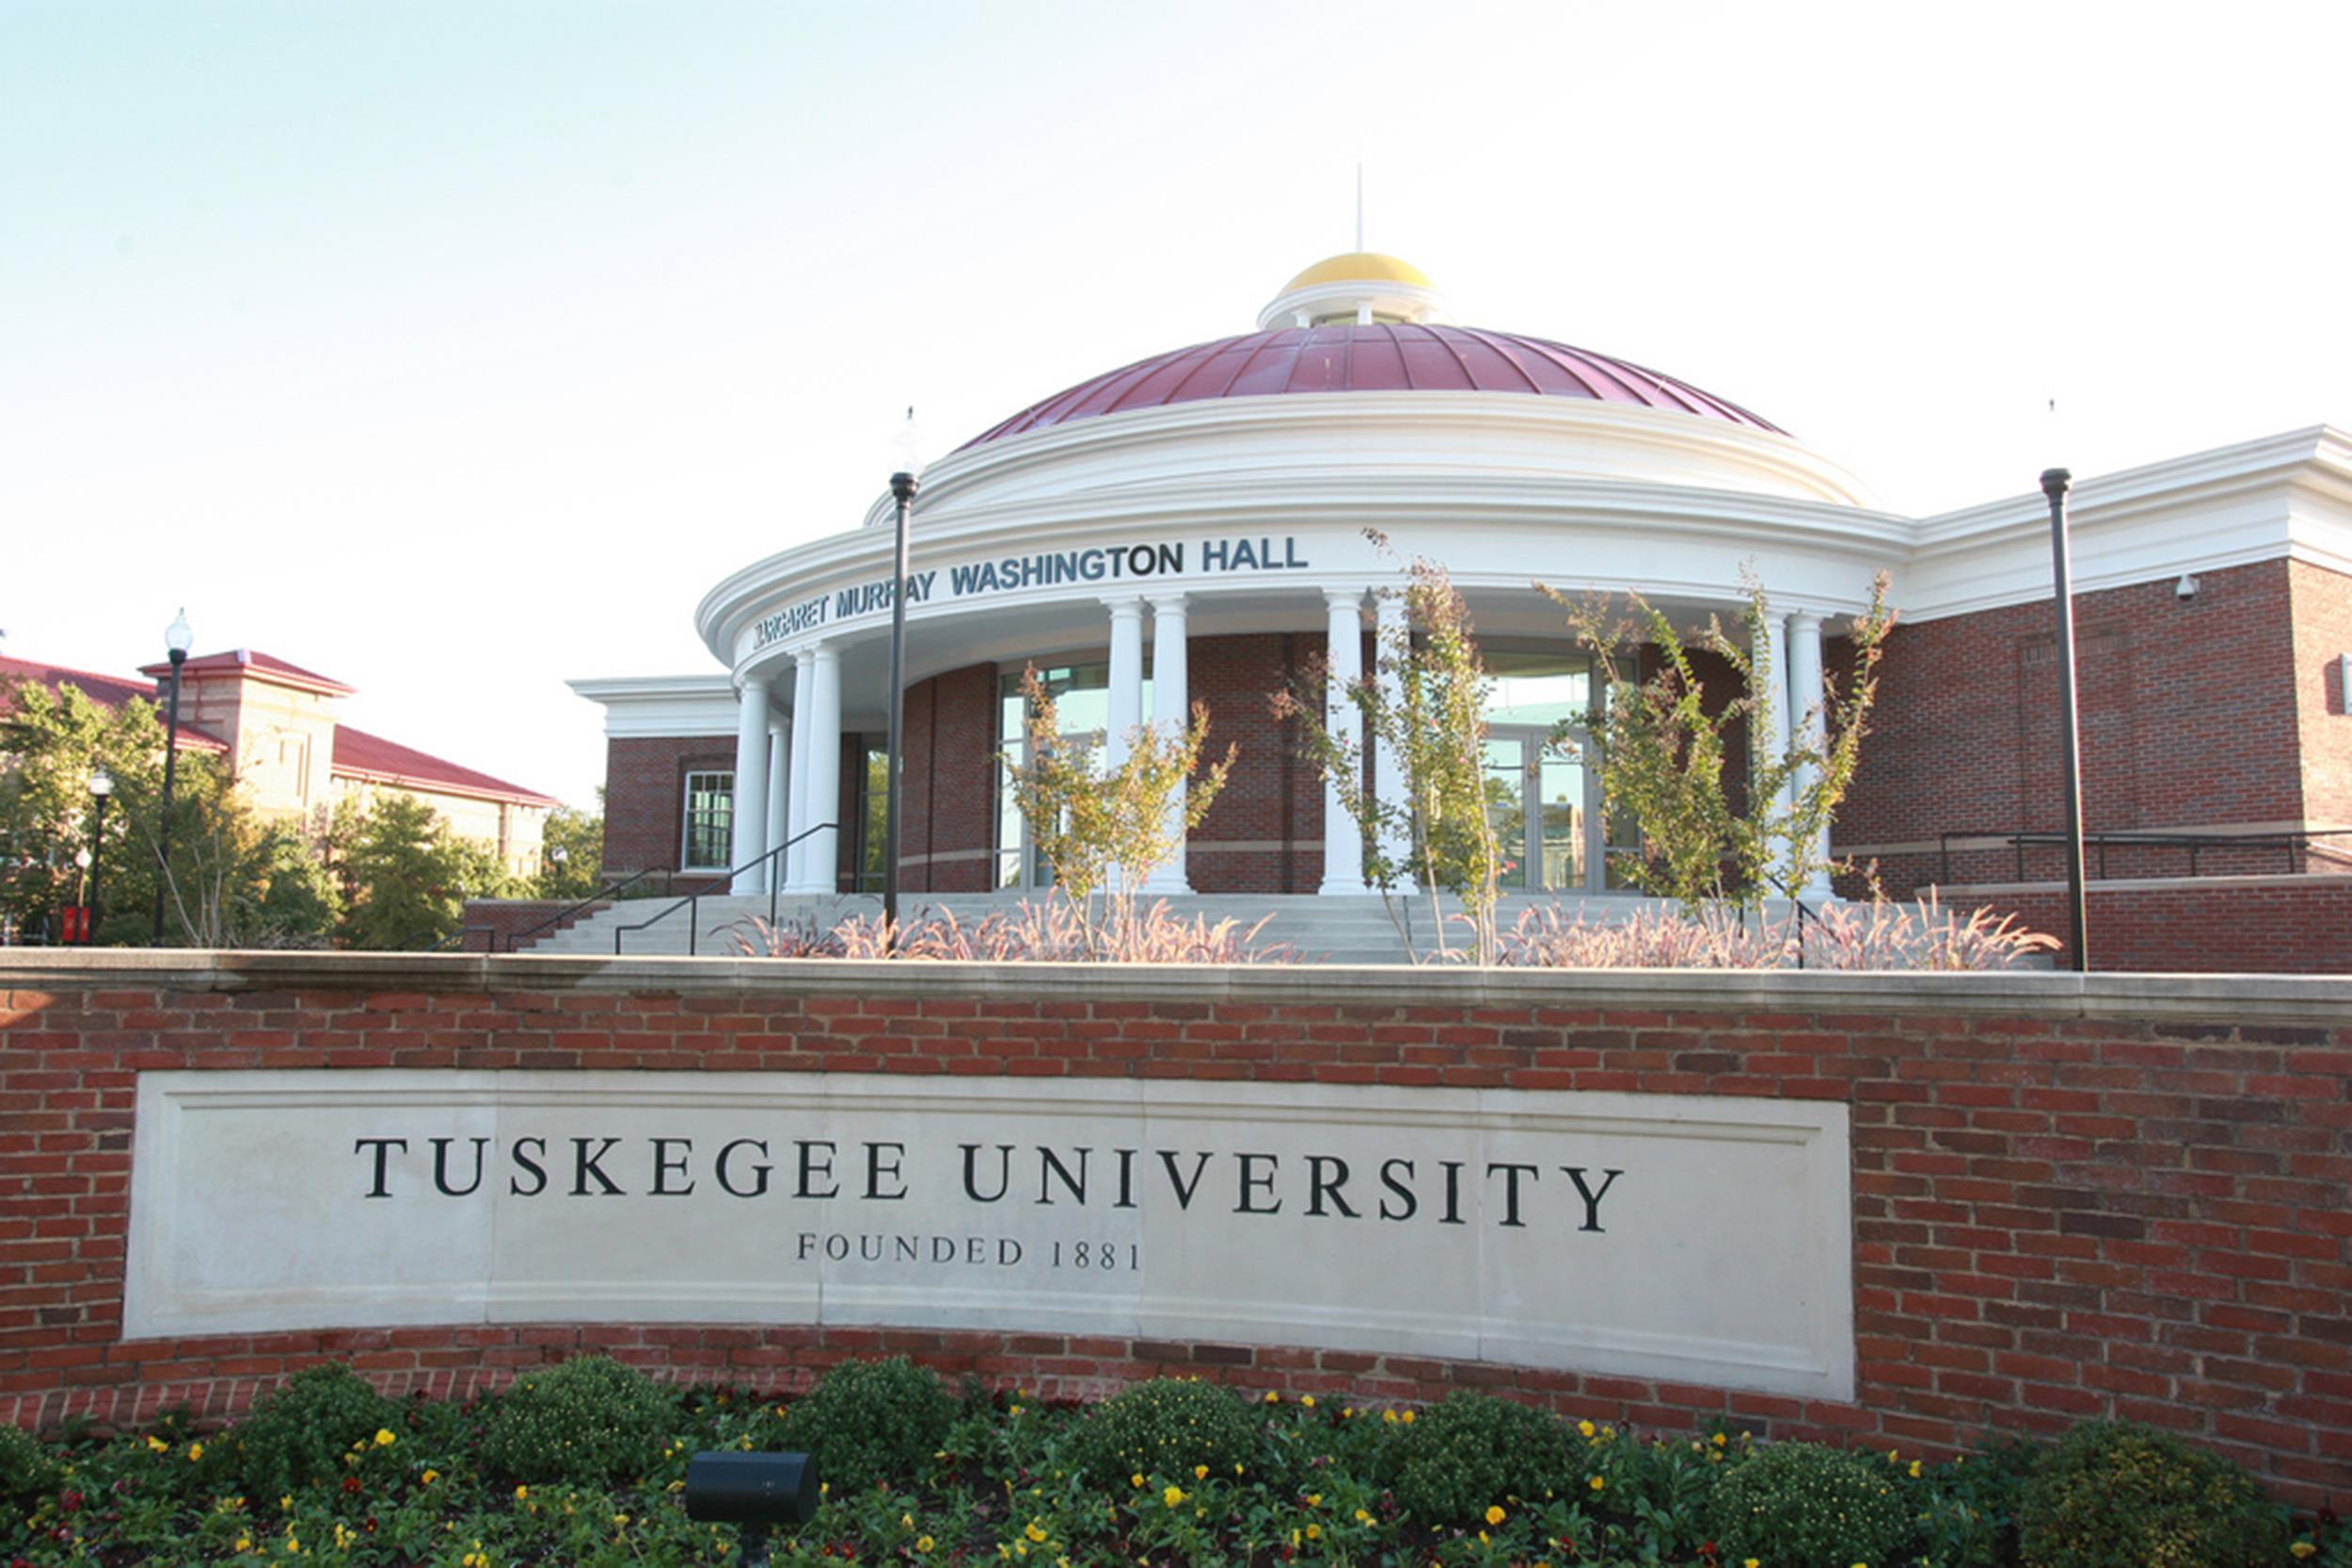 Image: Tuskegee University